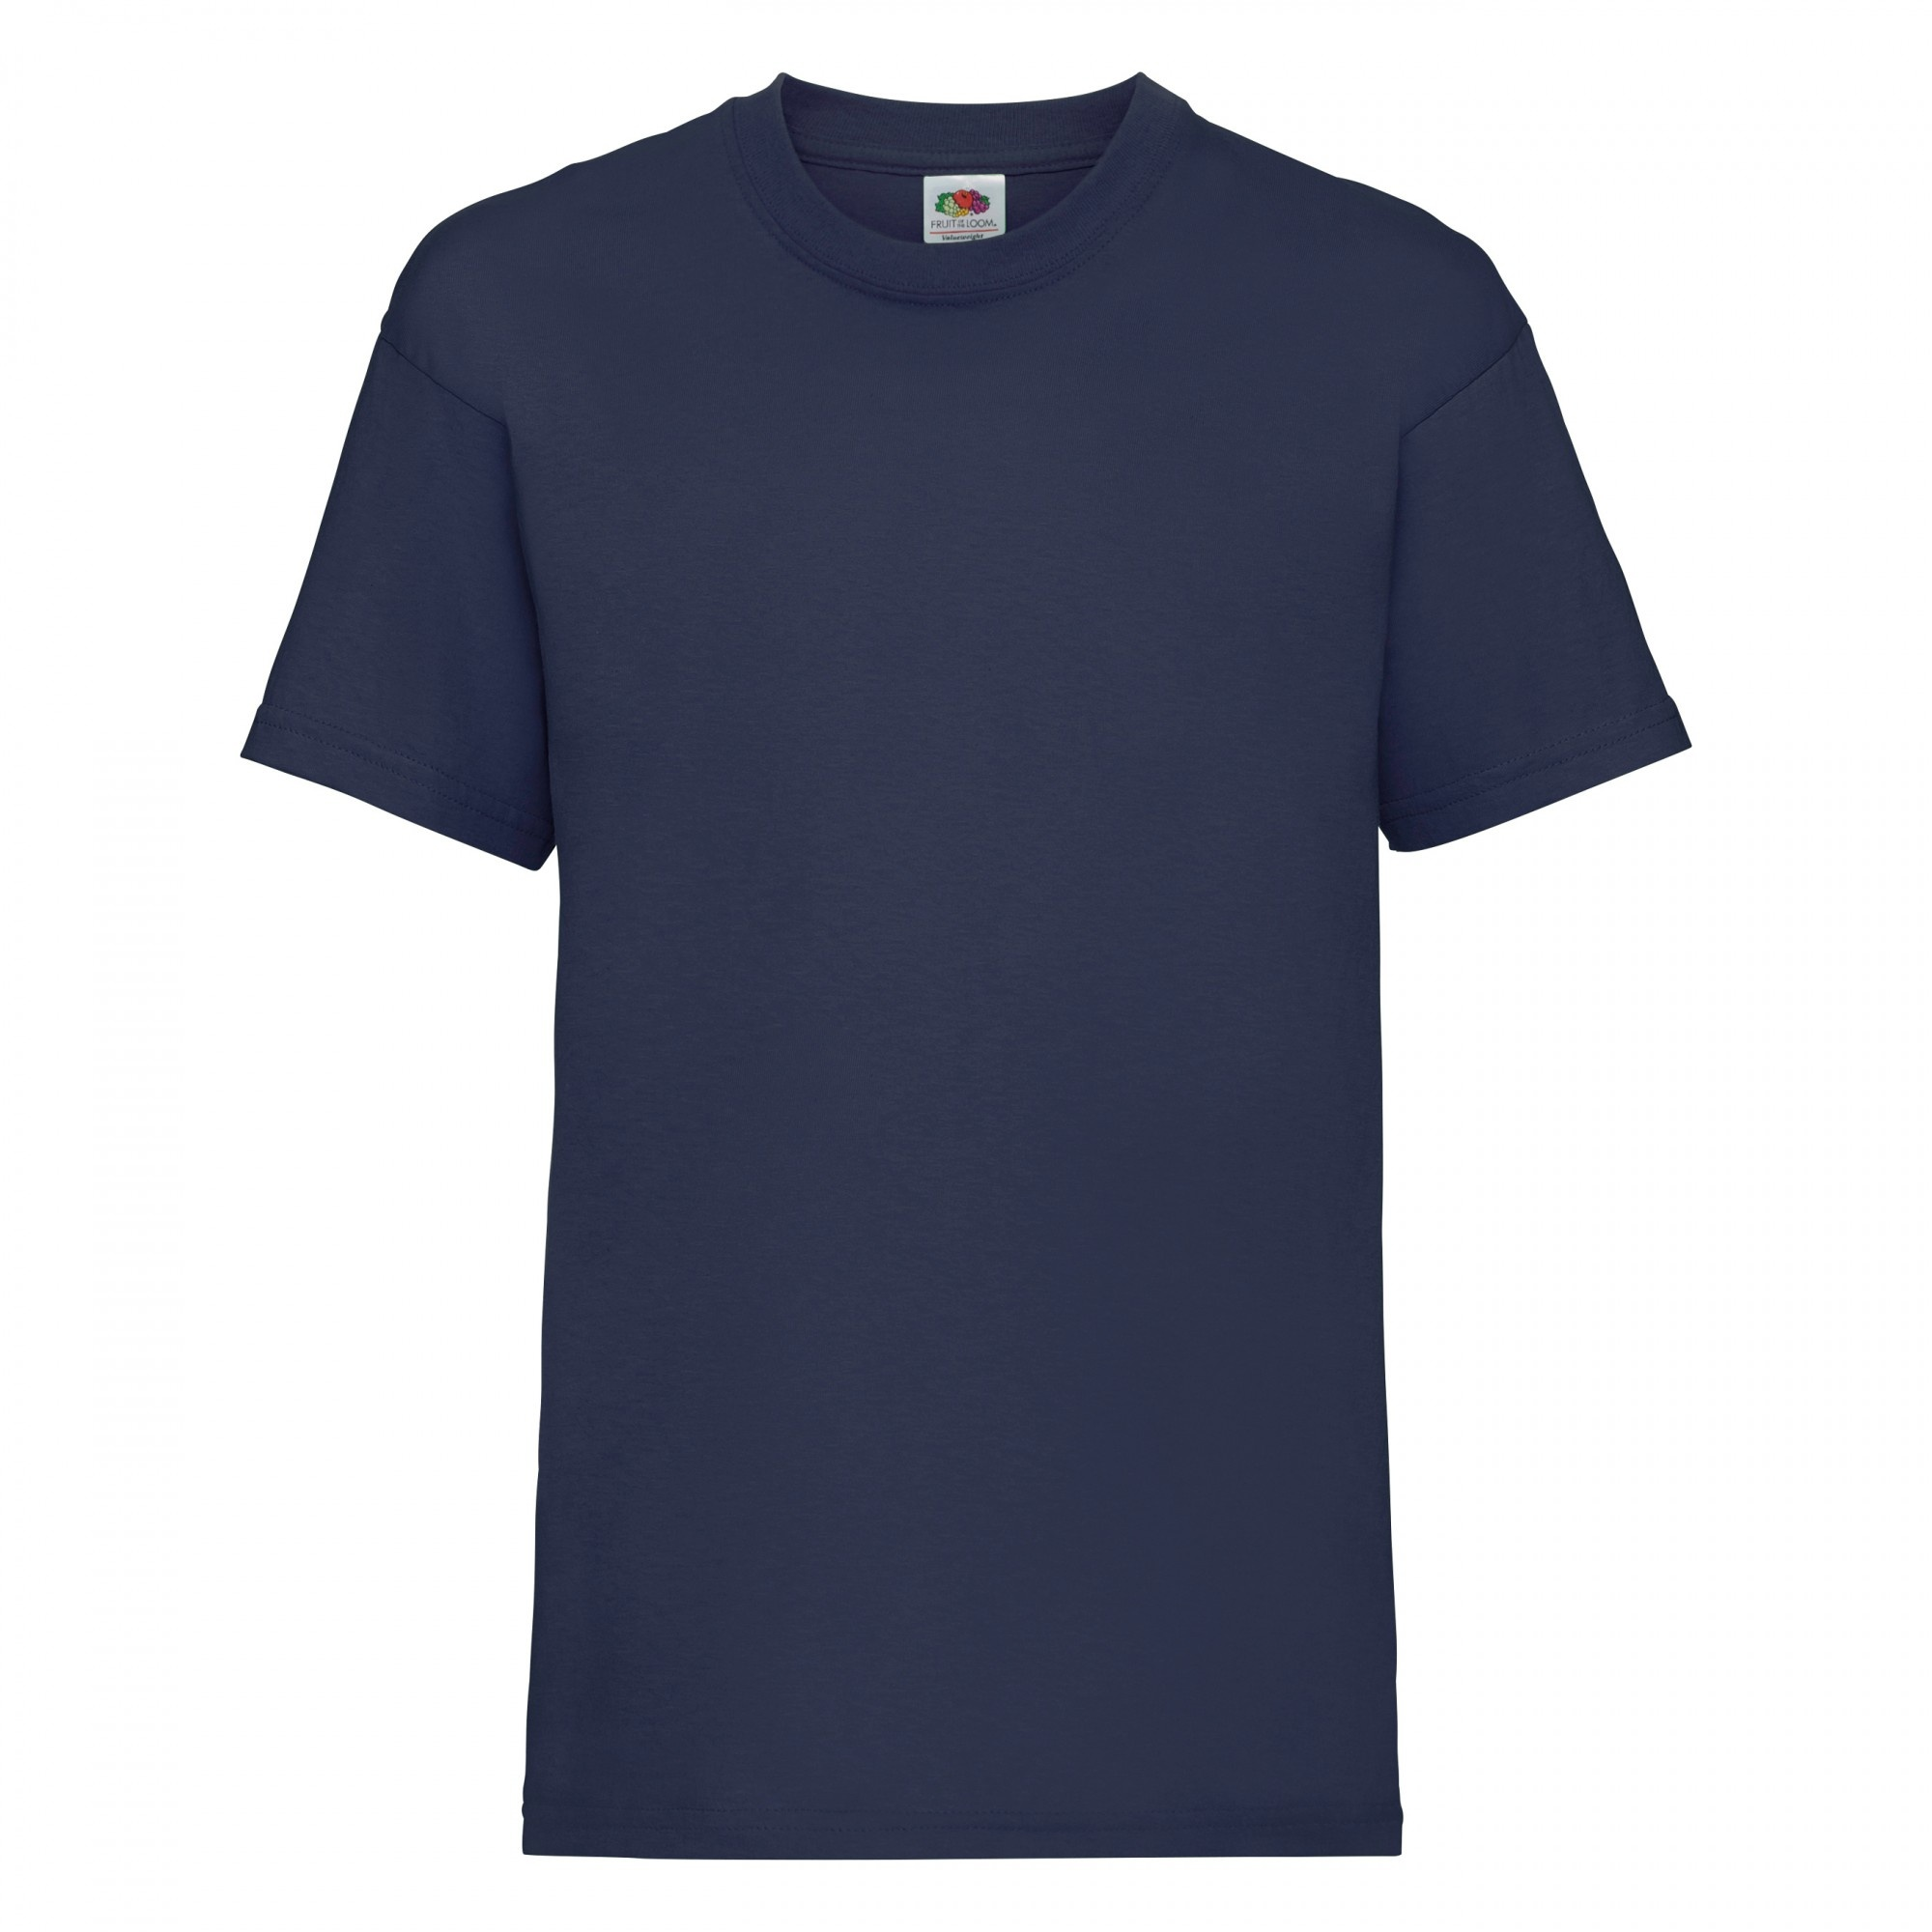 Fruit Of The Loom Childrens/Kids Unisex Valueweight Short Sleeve T-Shirt (14-15) (Navy)